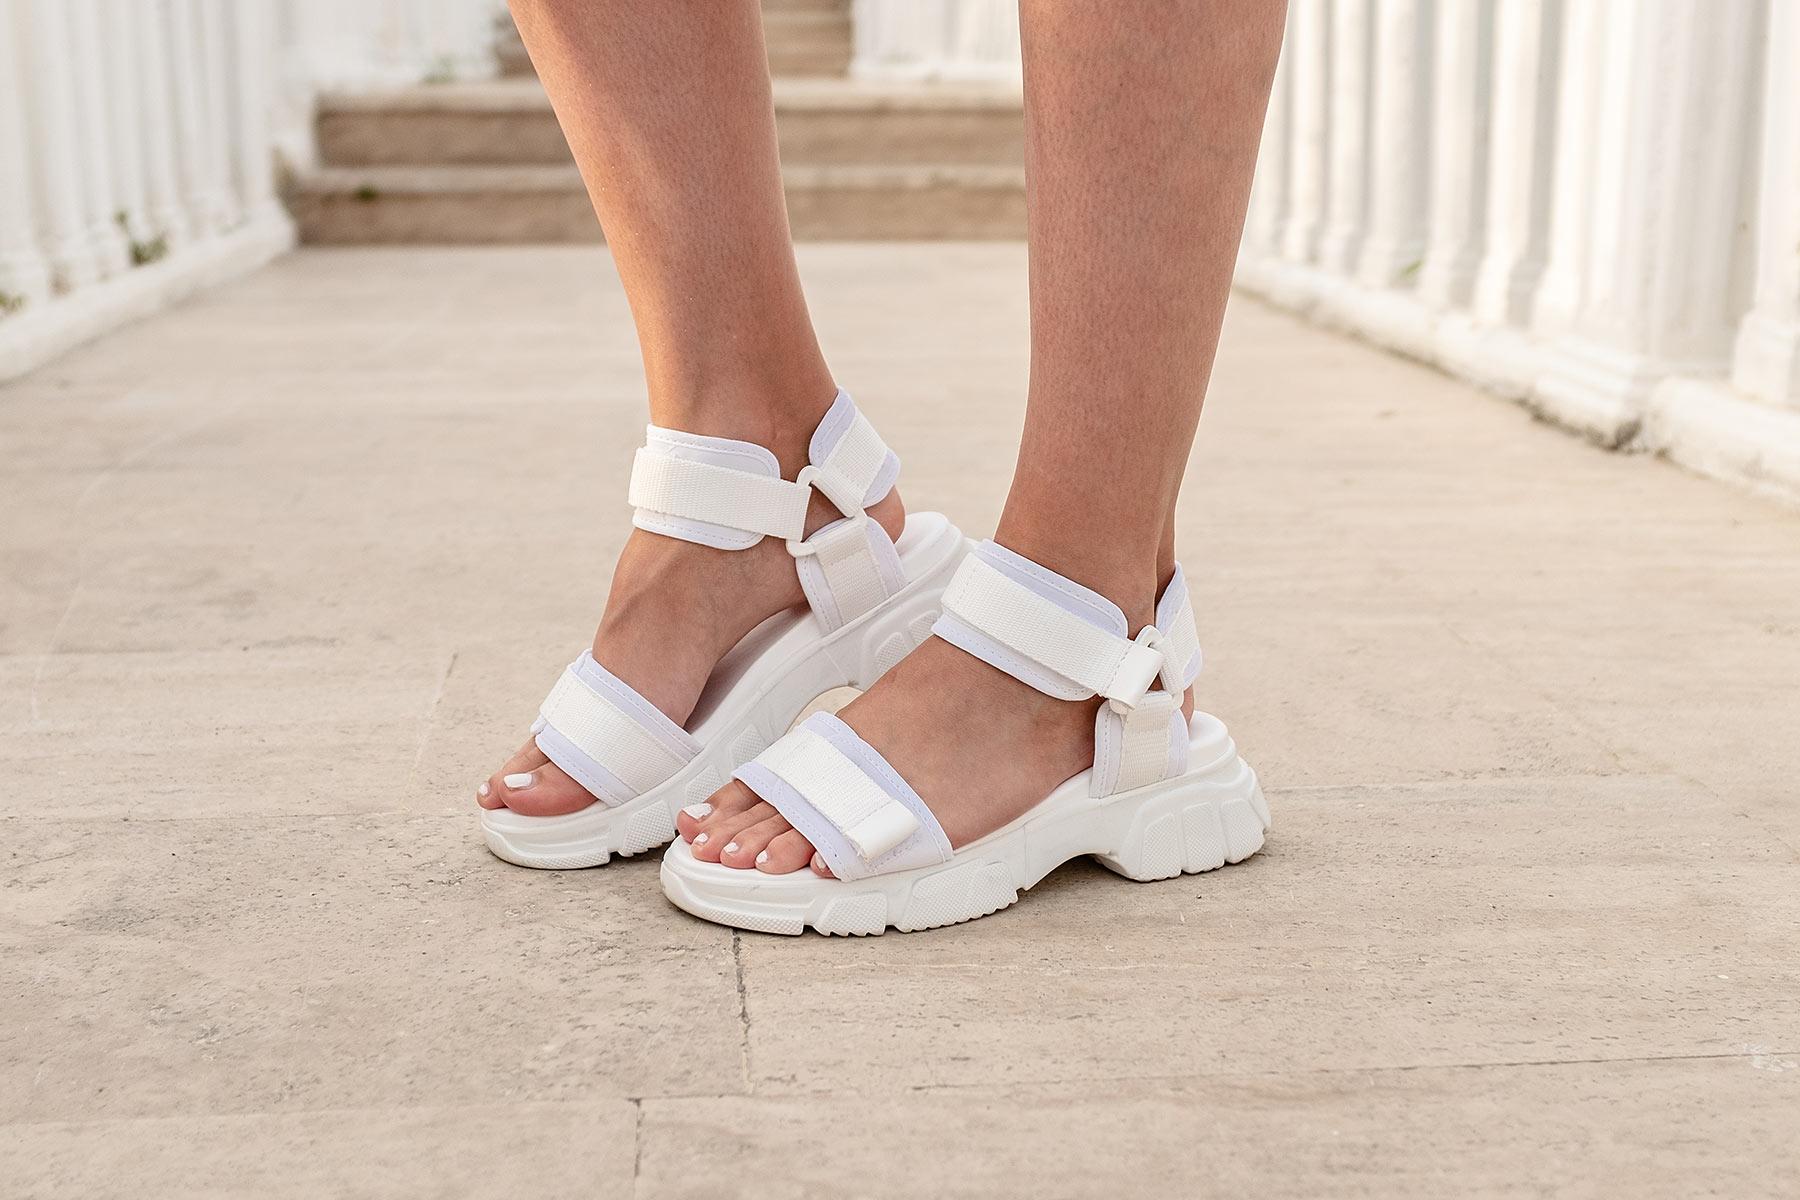 trekking-sandalen urban outfitters weiss fashion blogger inga brauer sunnyinga